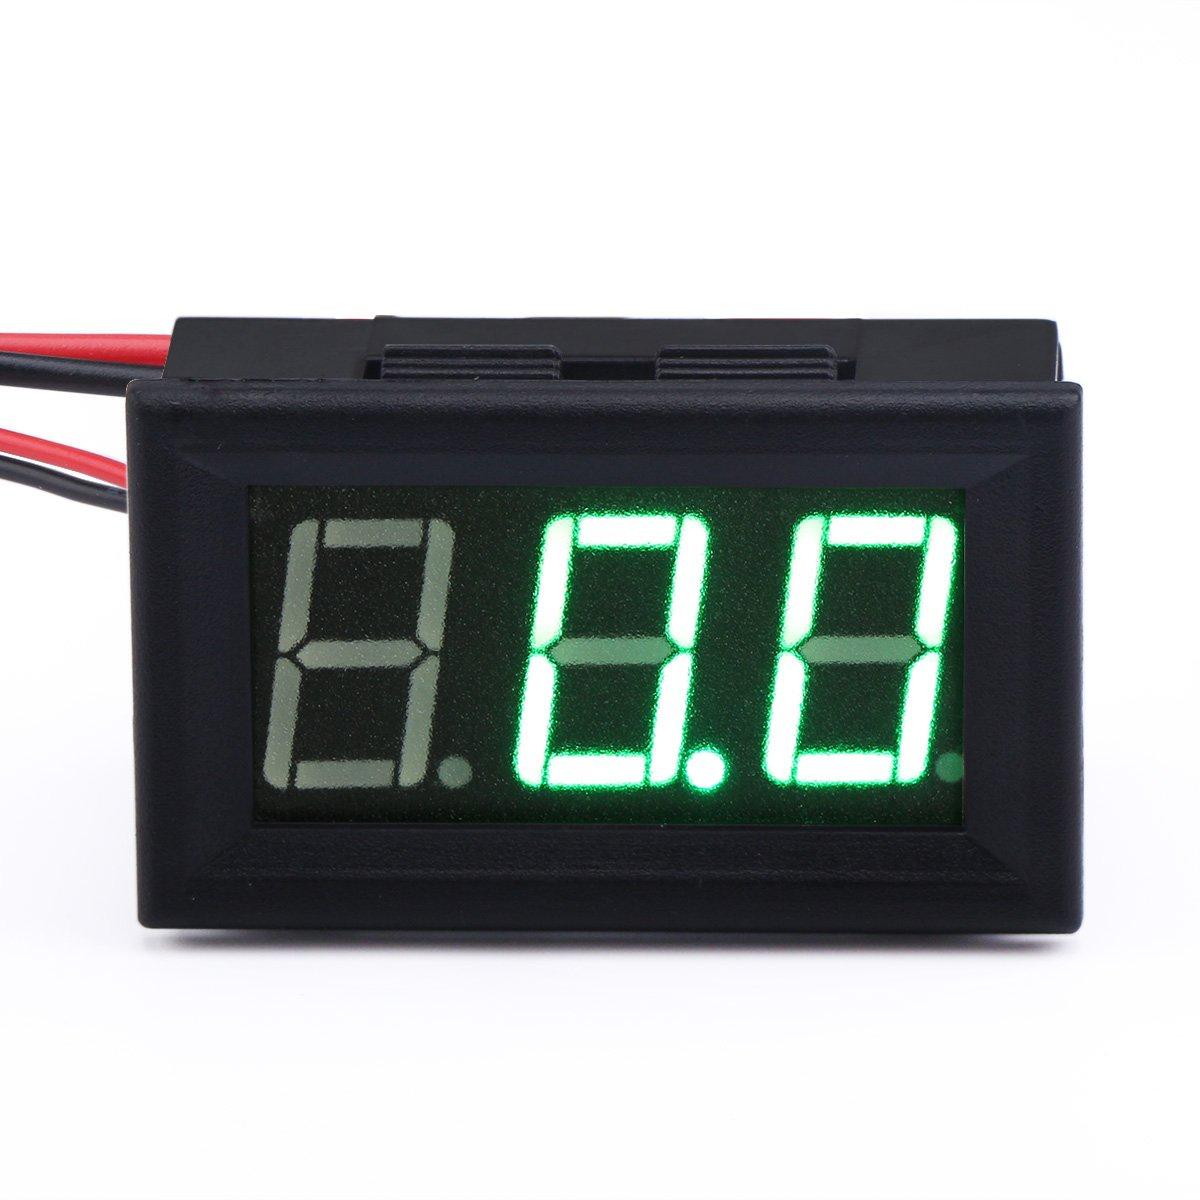 DROK 090914 Micro Amp Amperage Panel Meter LED Display